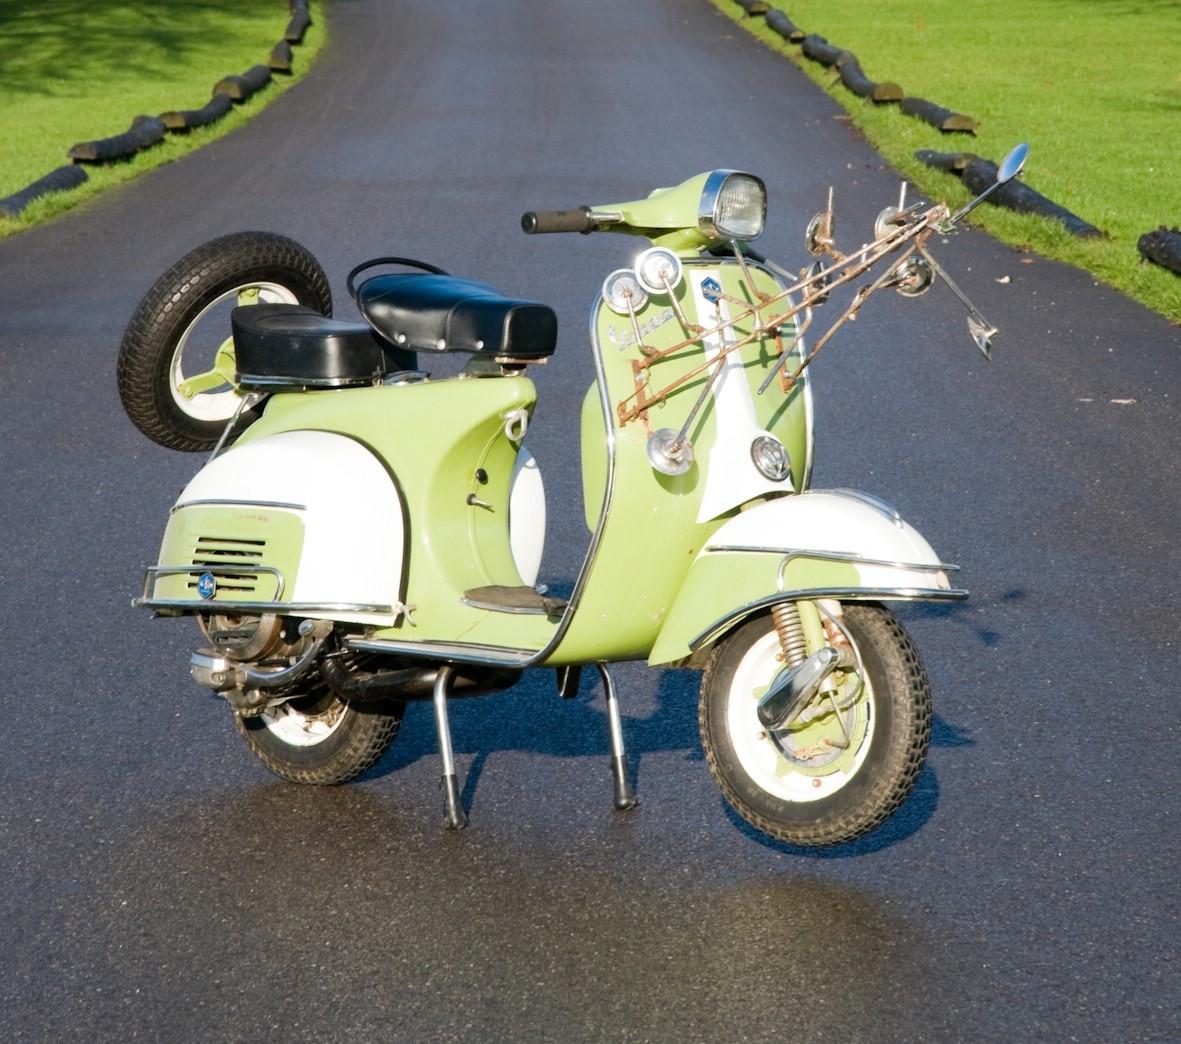 Top Gear Vietnam Special Bikes Join Museum Exhibition